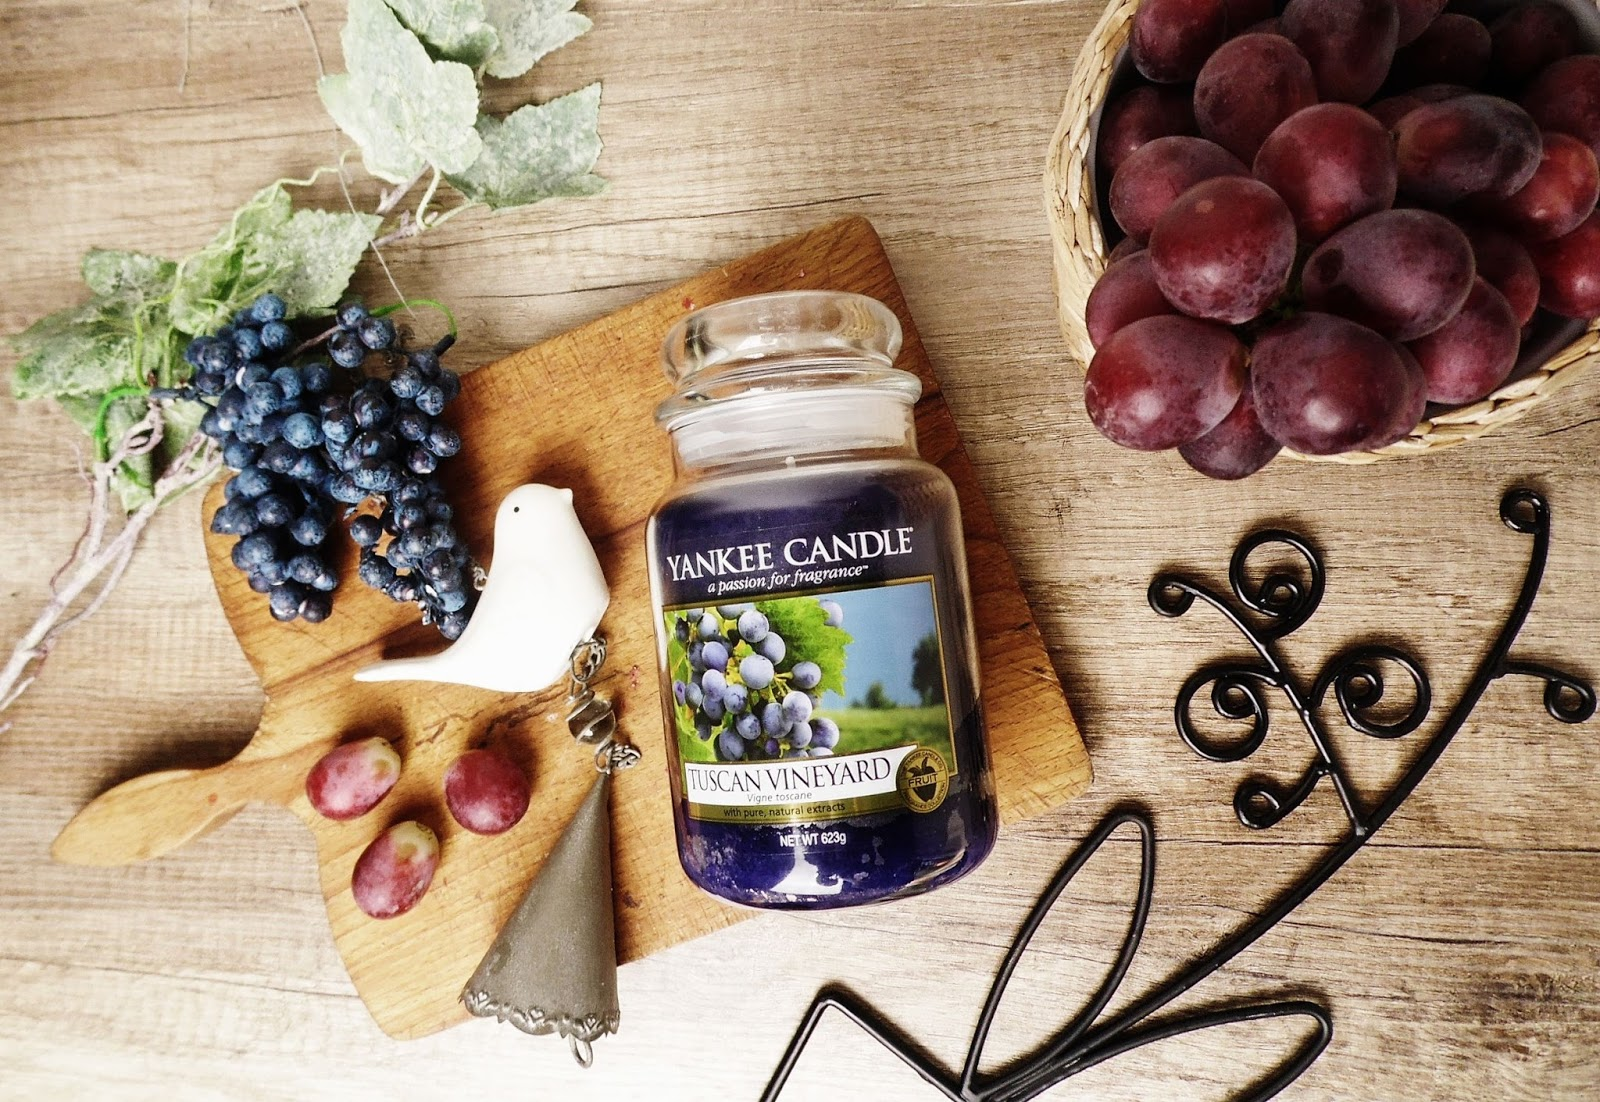 Yankee Candle Tuscan Vineyard